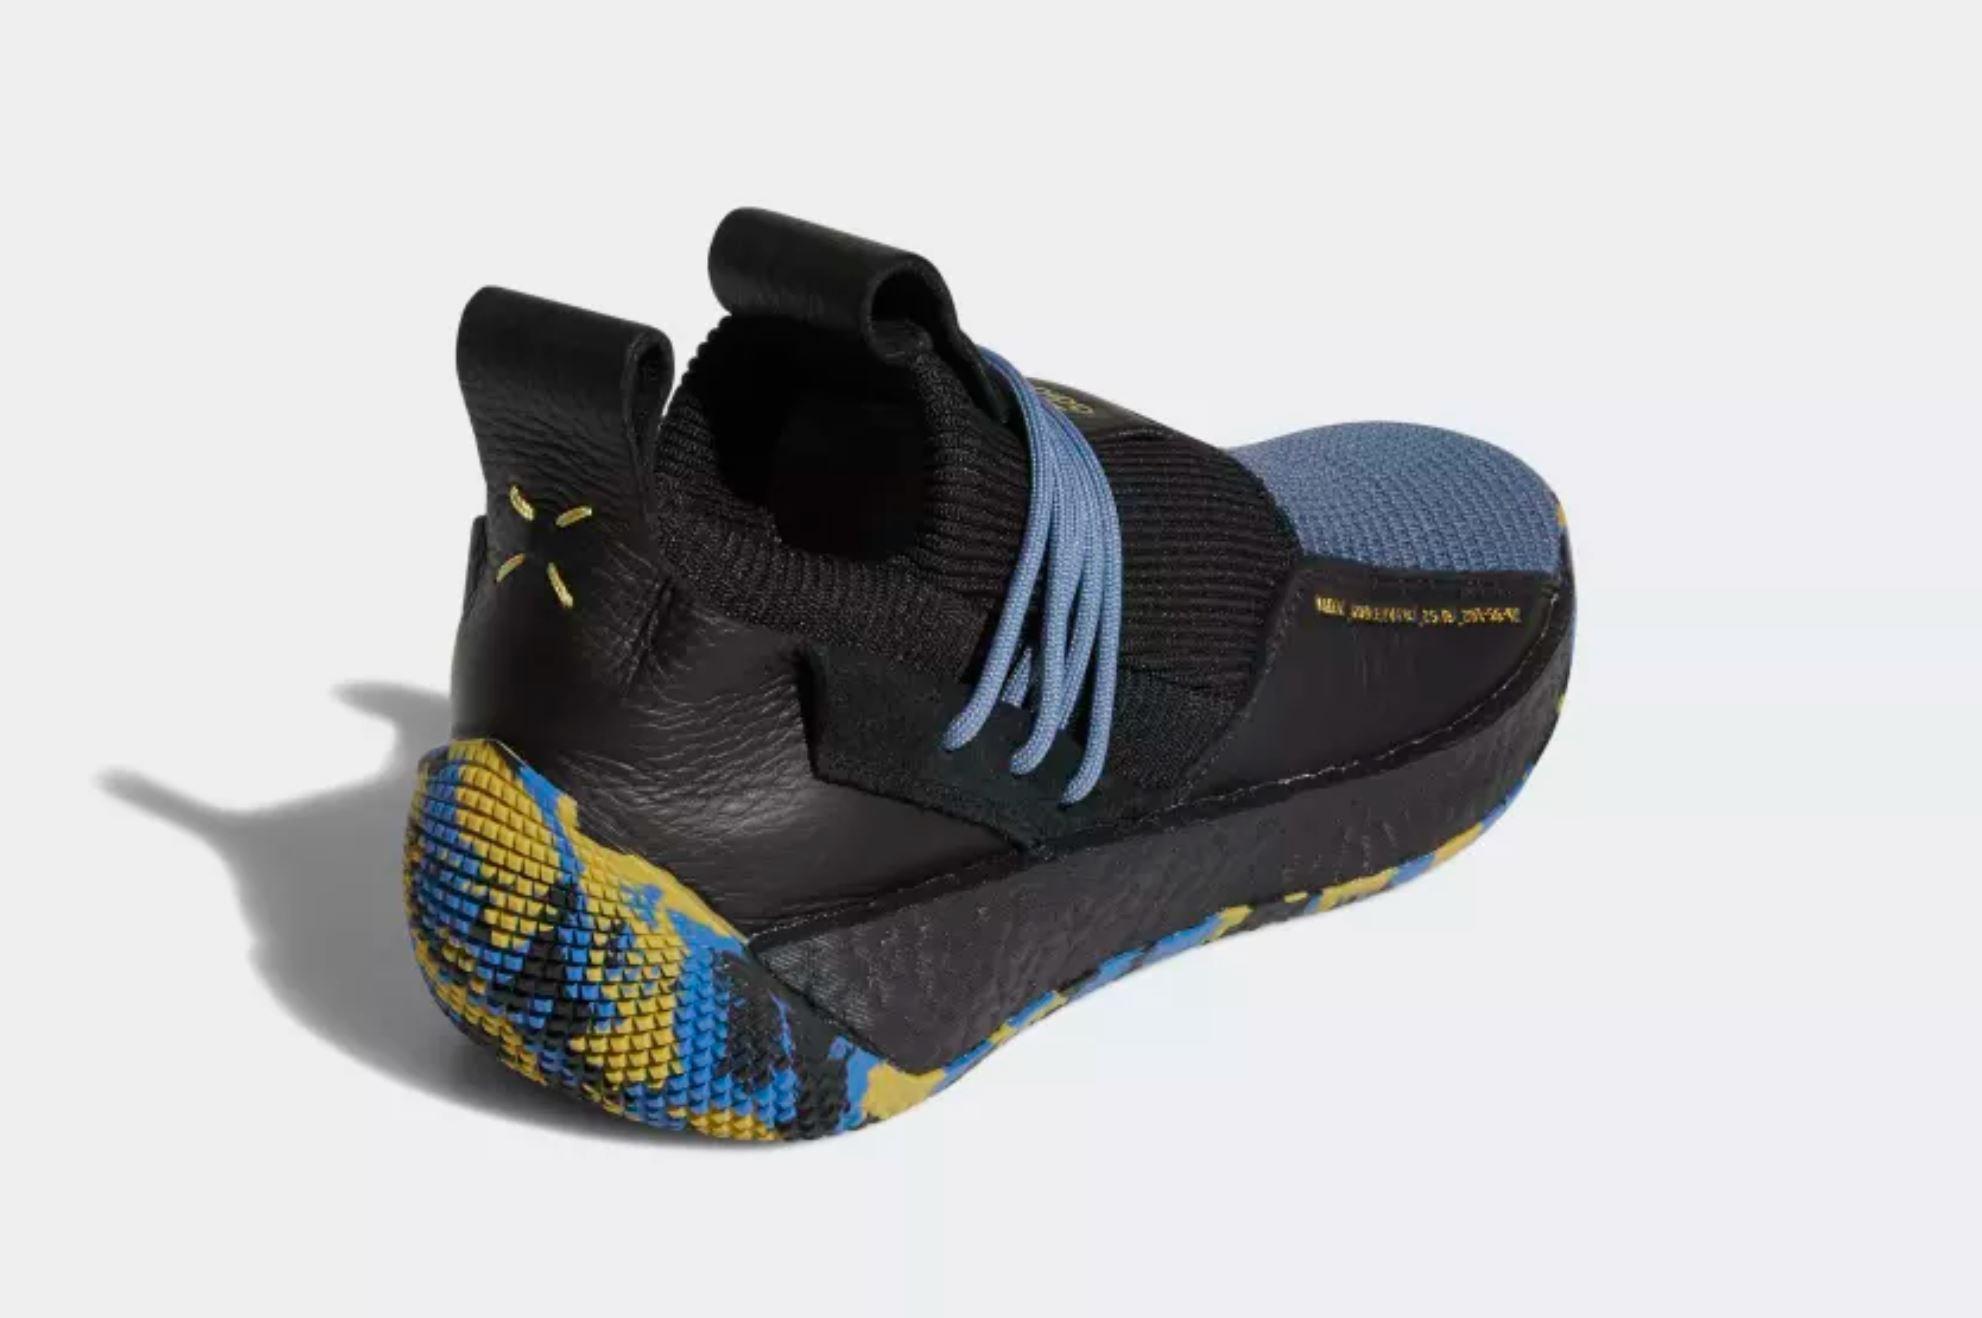 ba2d8fa40ed adidas harden LS 2 Lace MVP heel - WearTesters